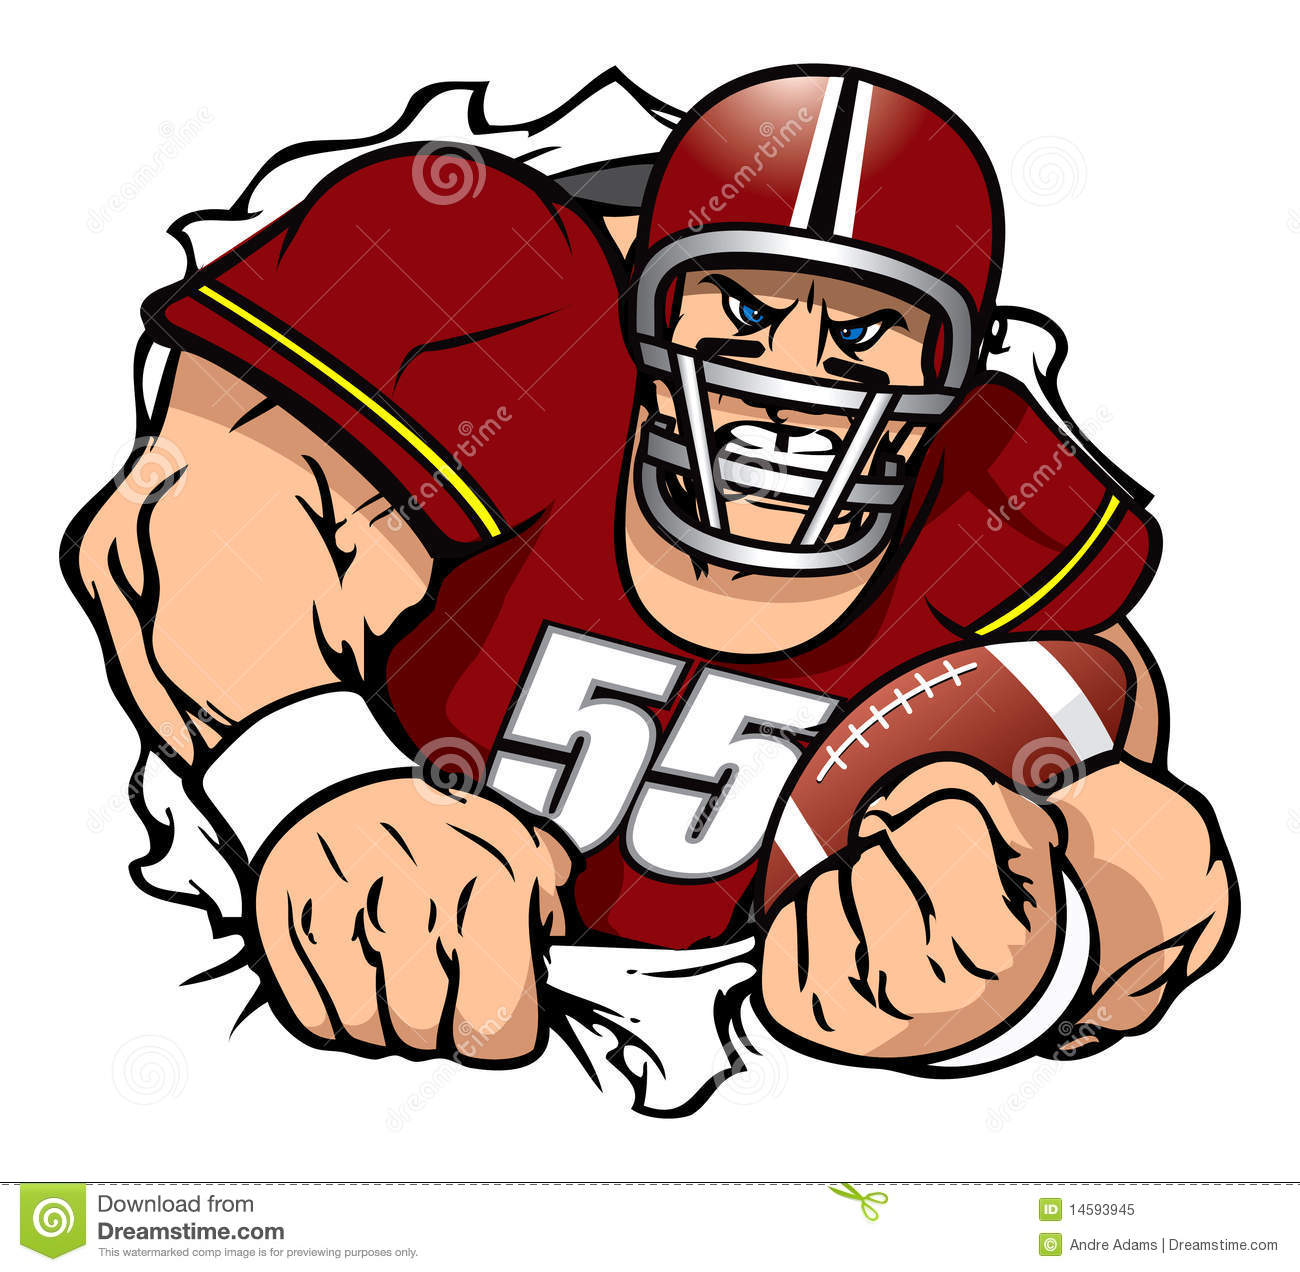 Cartoon football player clipart.